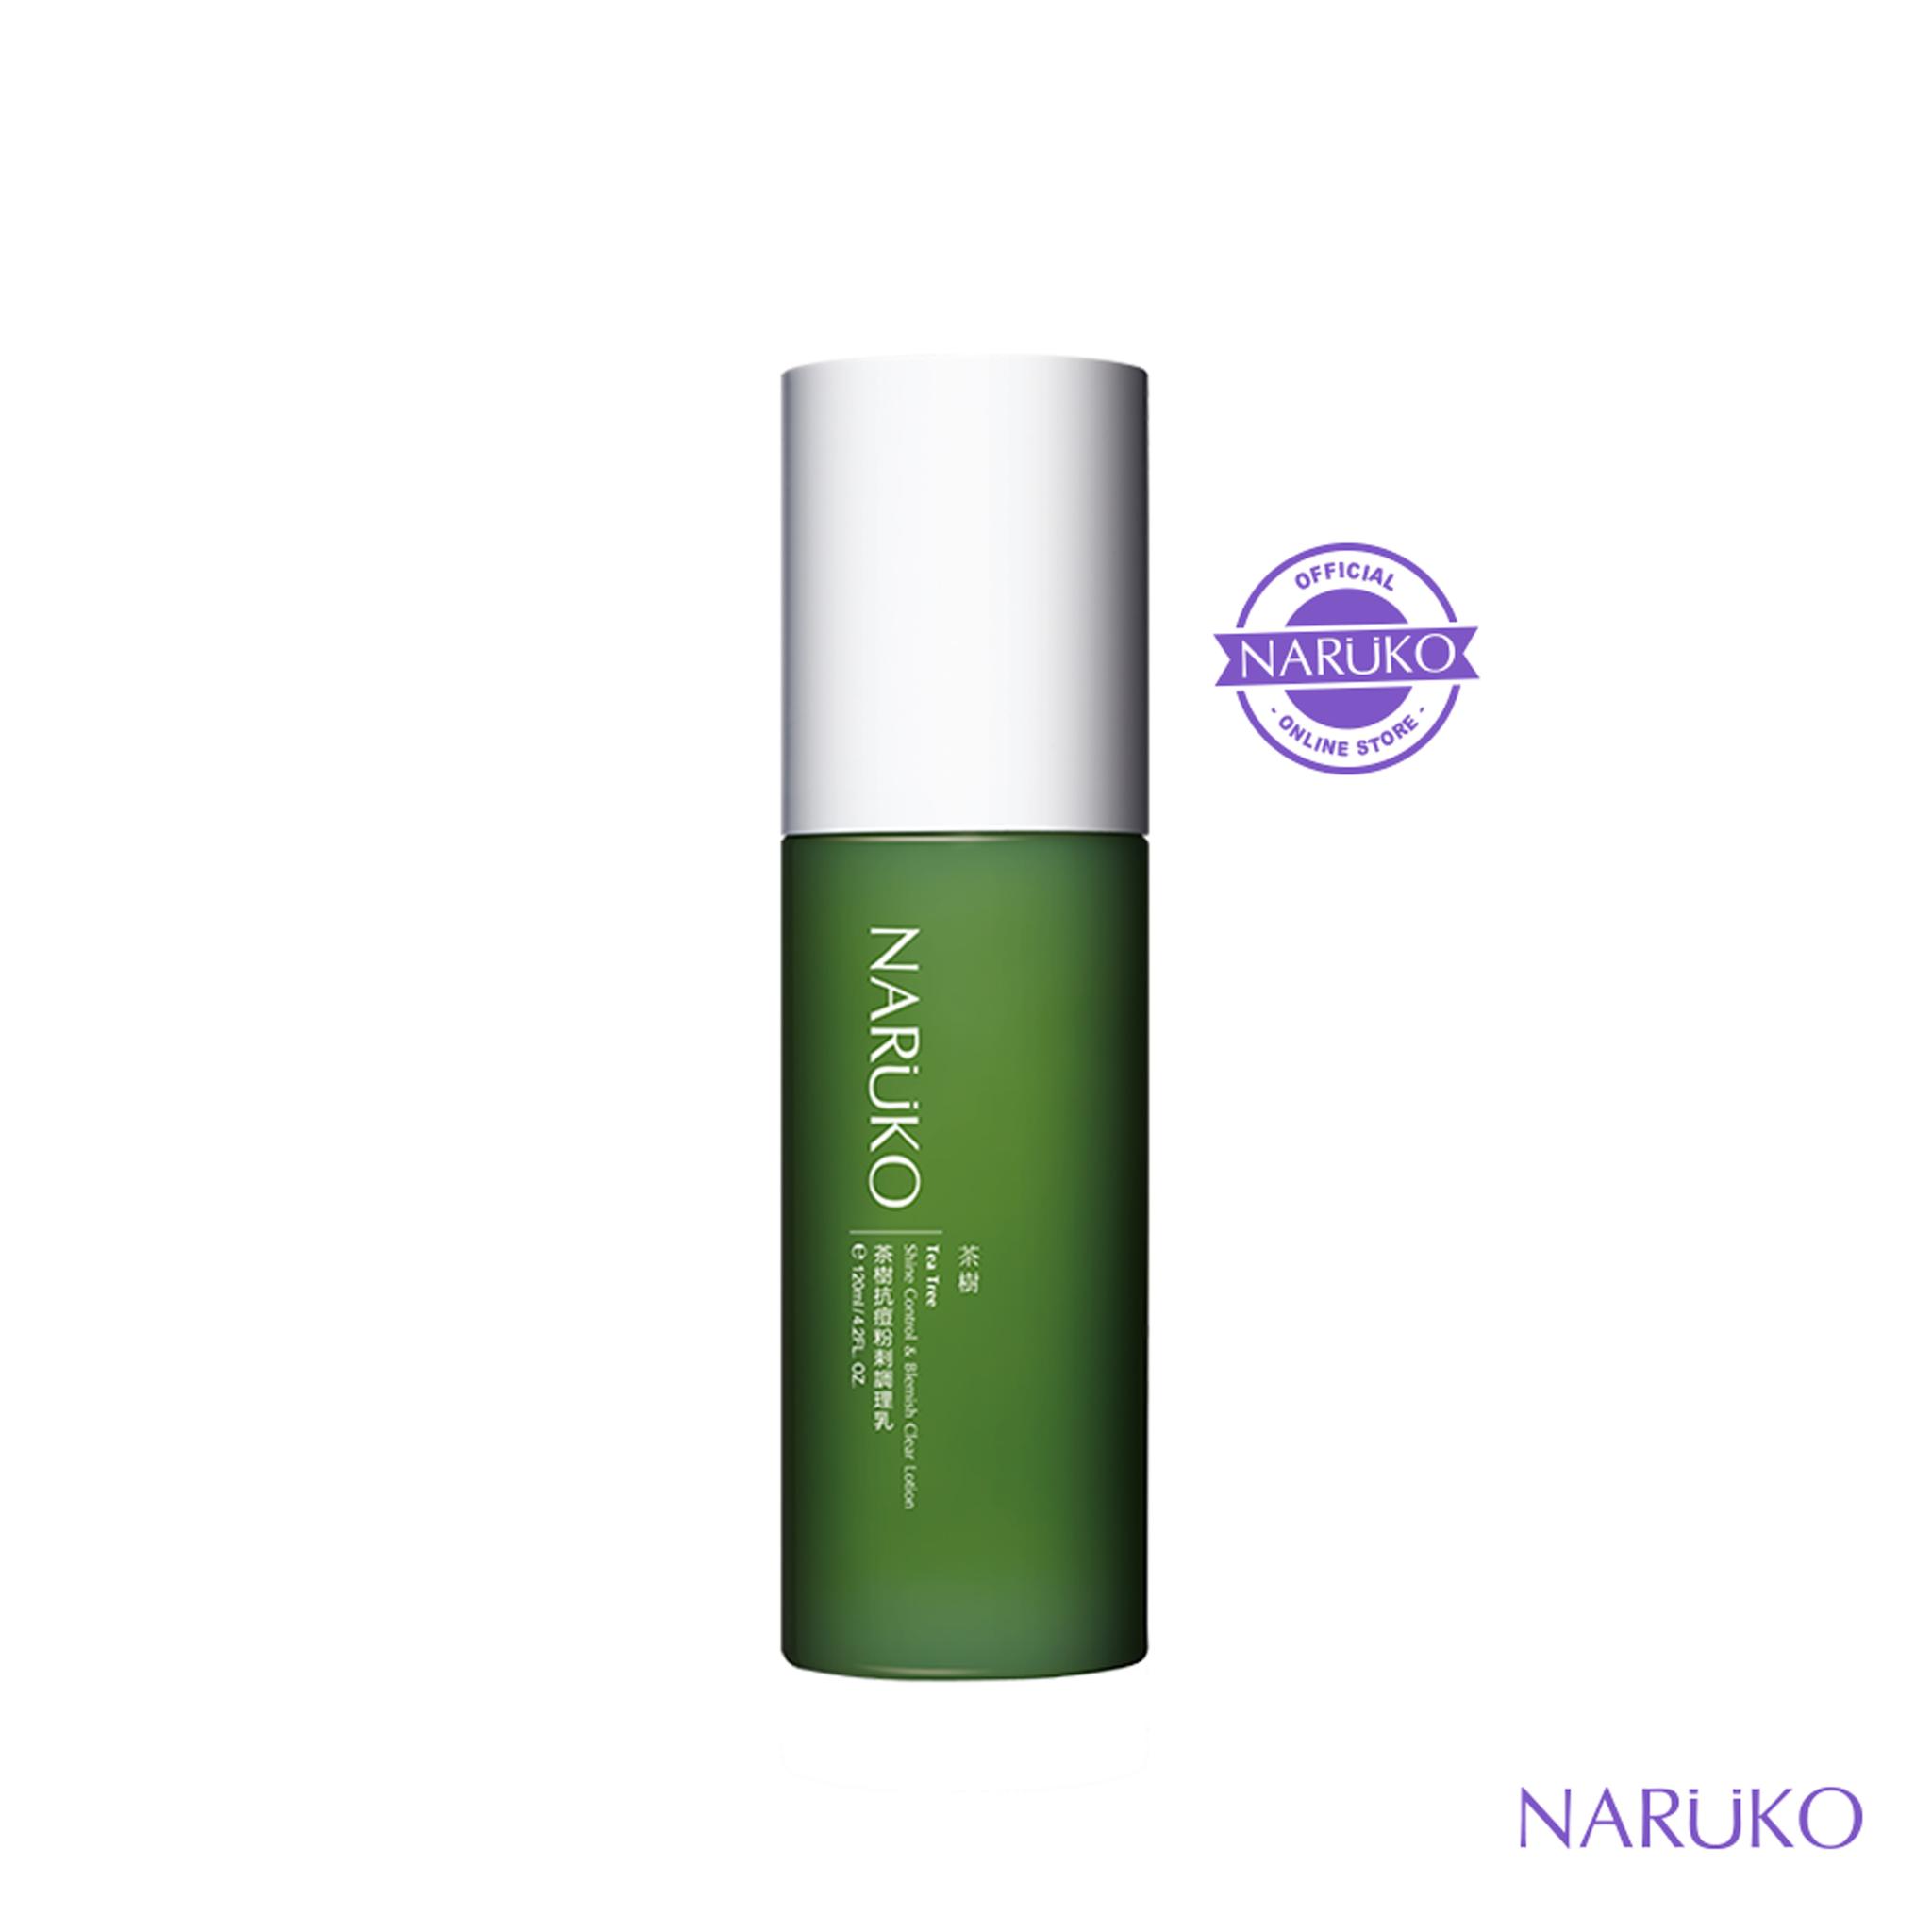 Naruko Tea Tree Shine Control & Lotion 120ML thumbnail